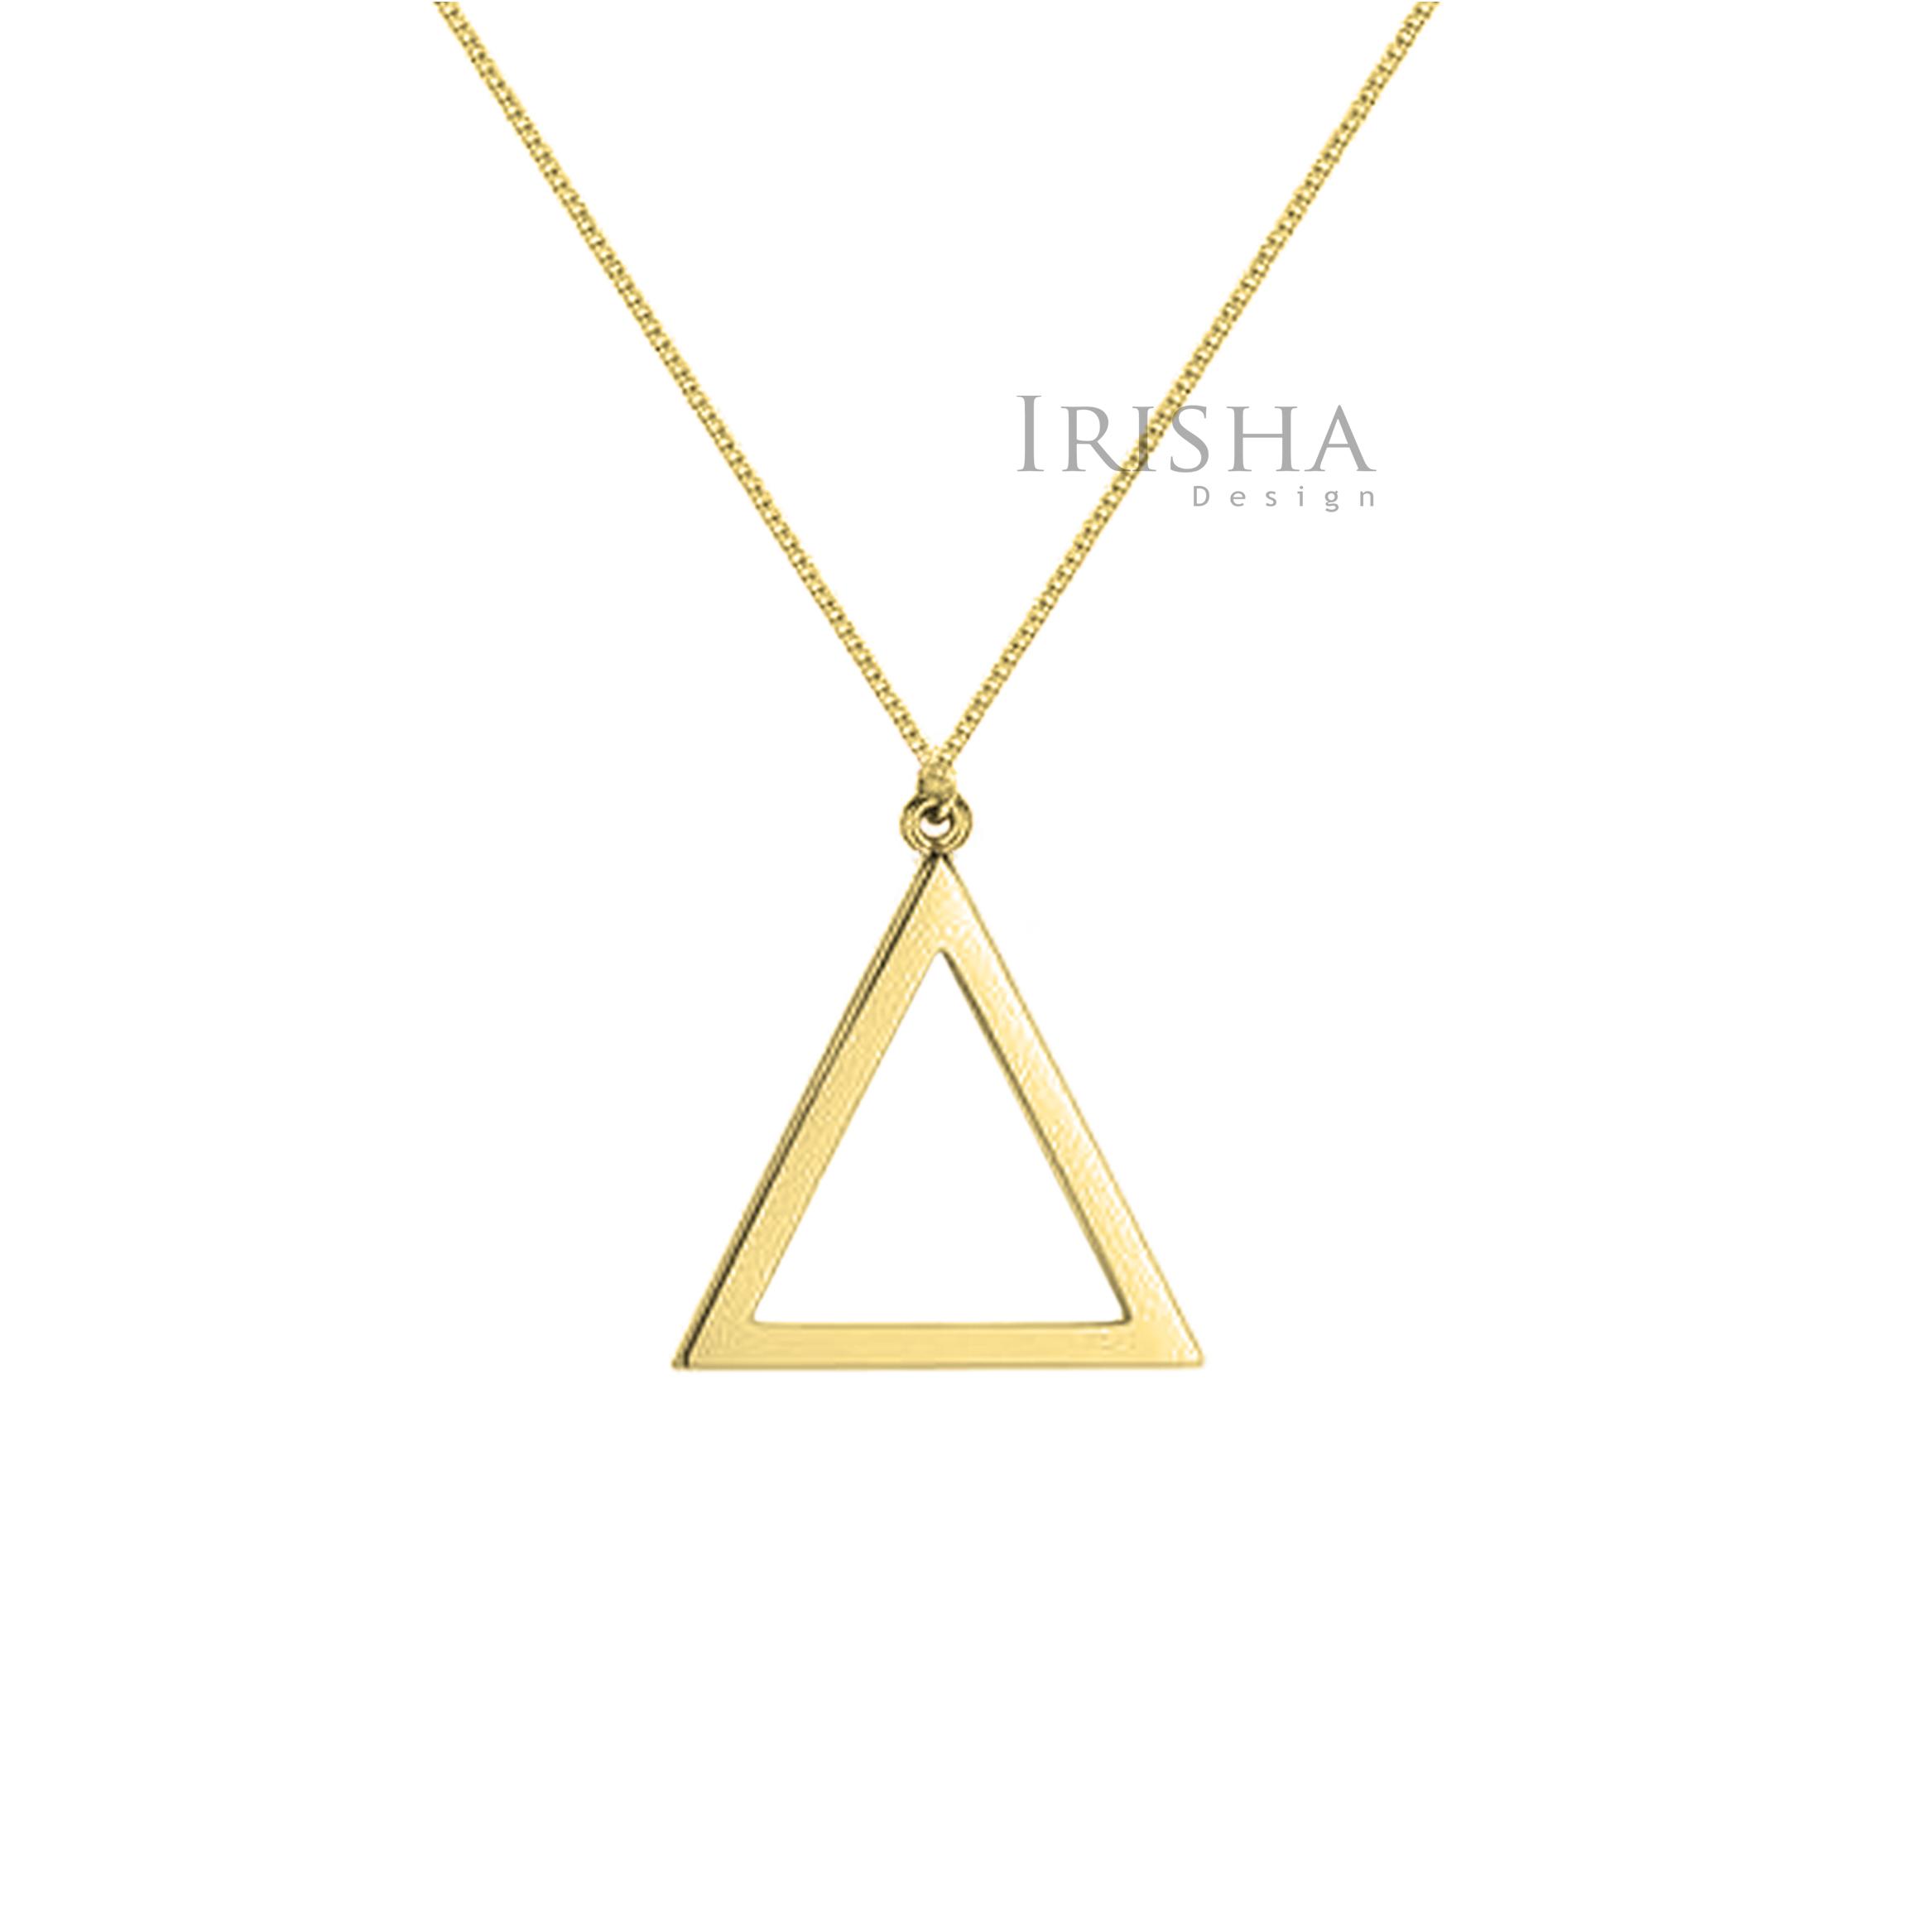 14K Solid Plain Gold Triangle Shape Pendant Necklace Handmade Fine Jewelry